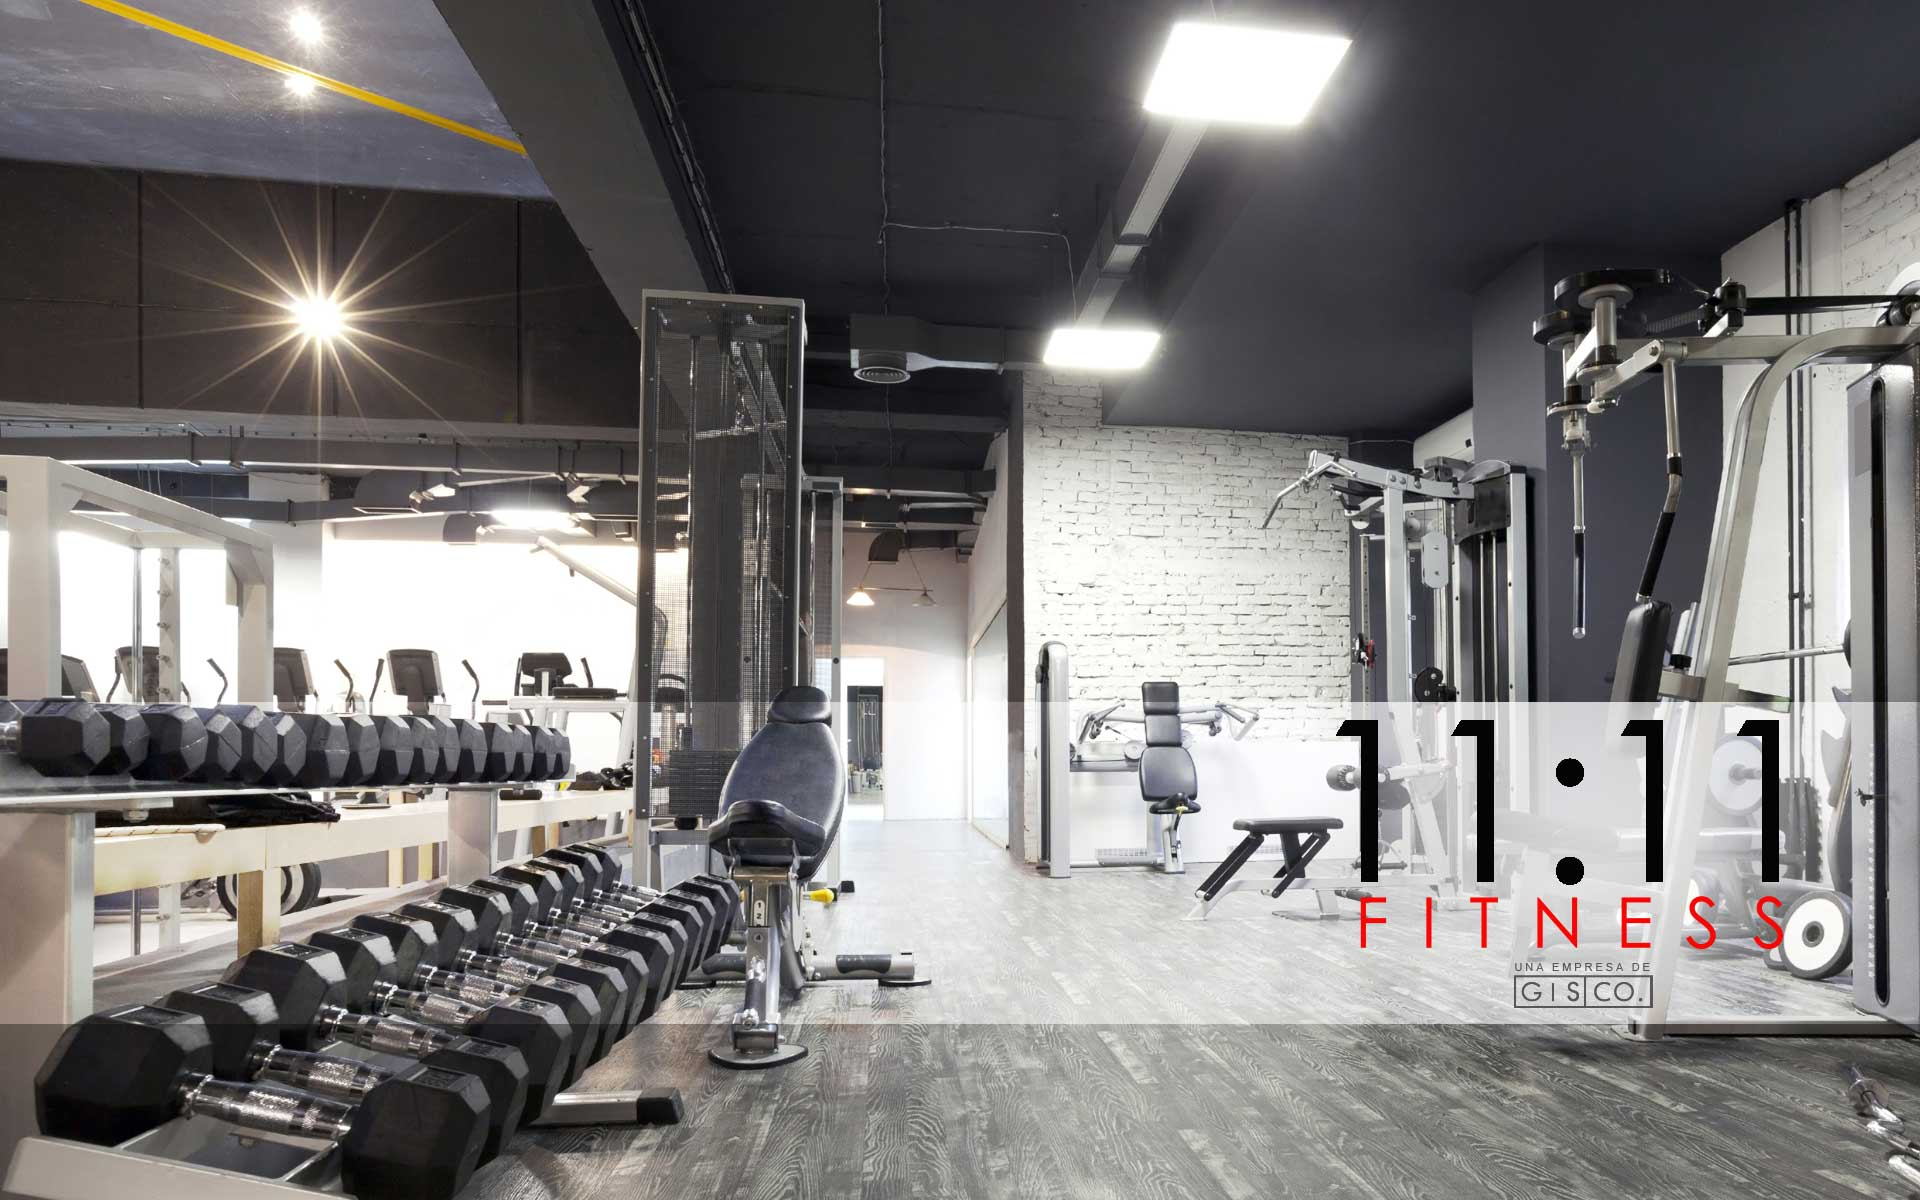 11:11 Fitness